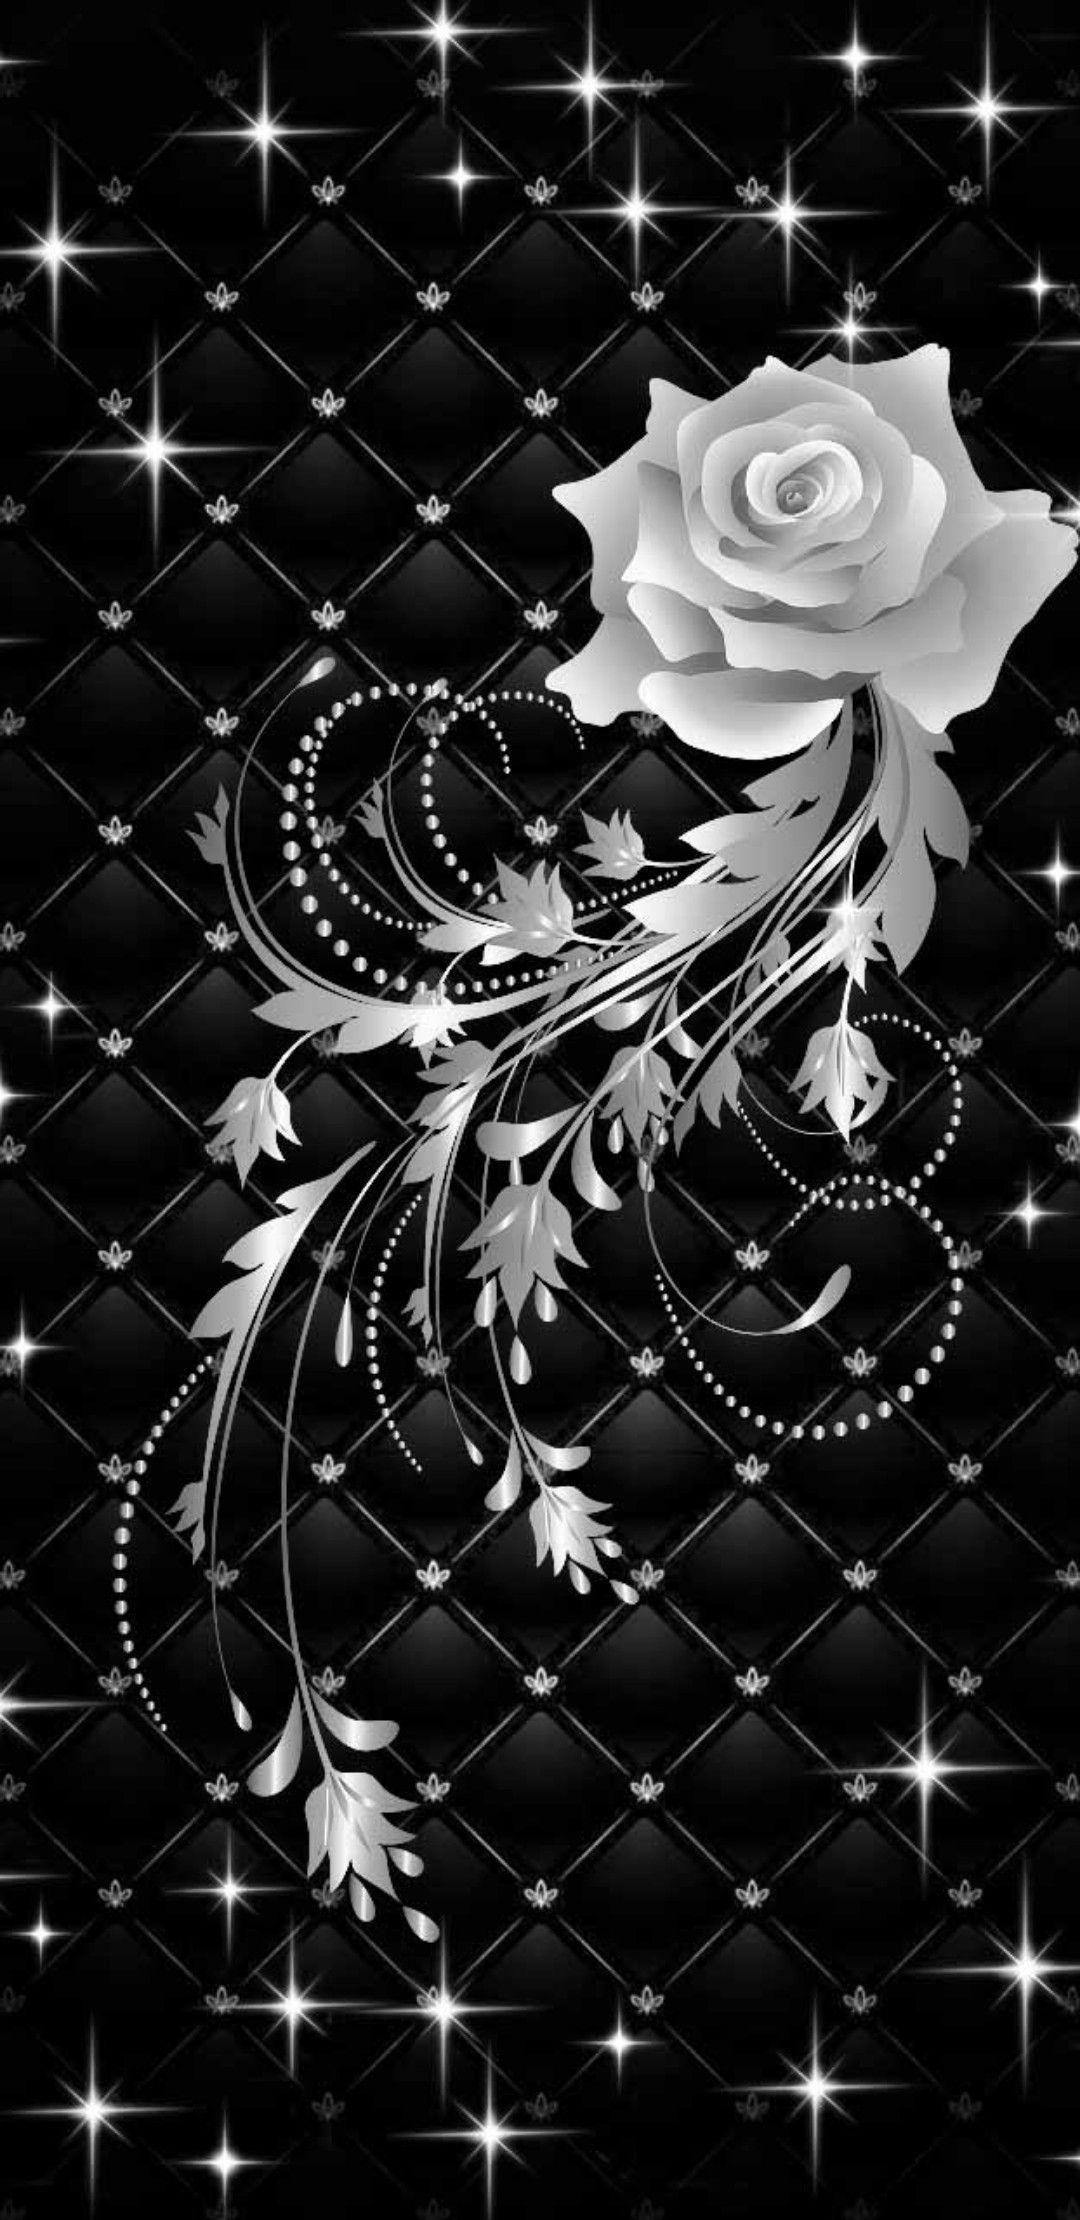 Monochrome Black And White Rose Silver Rose Wallpaper Black